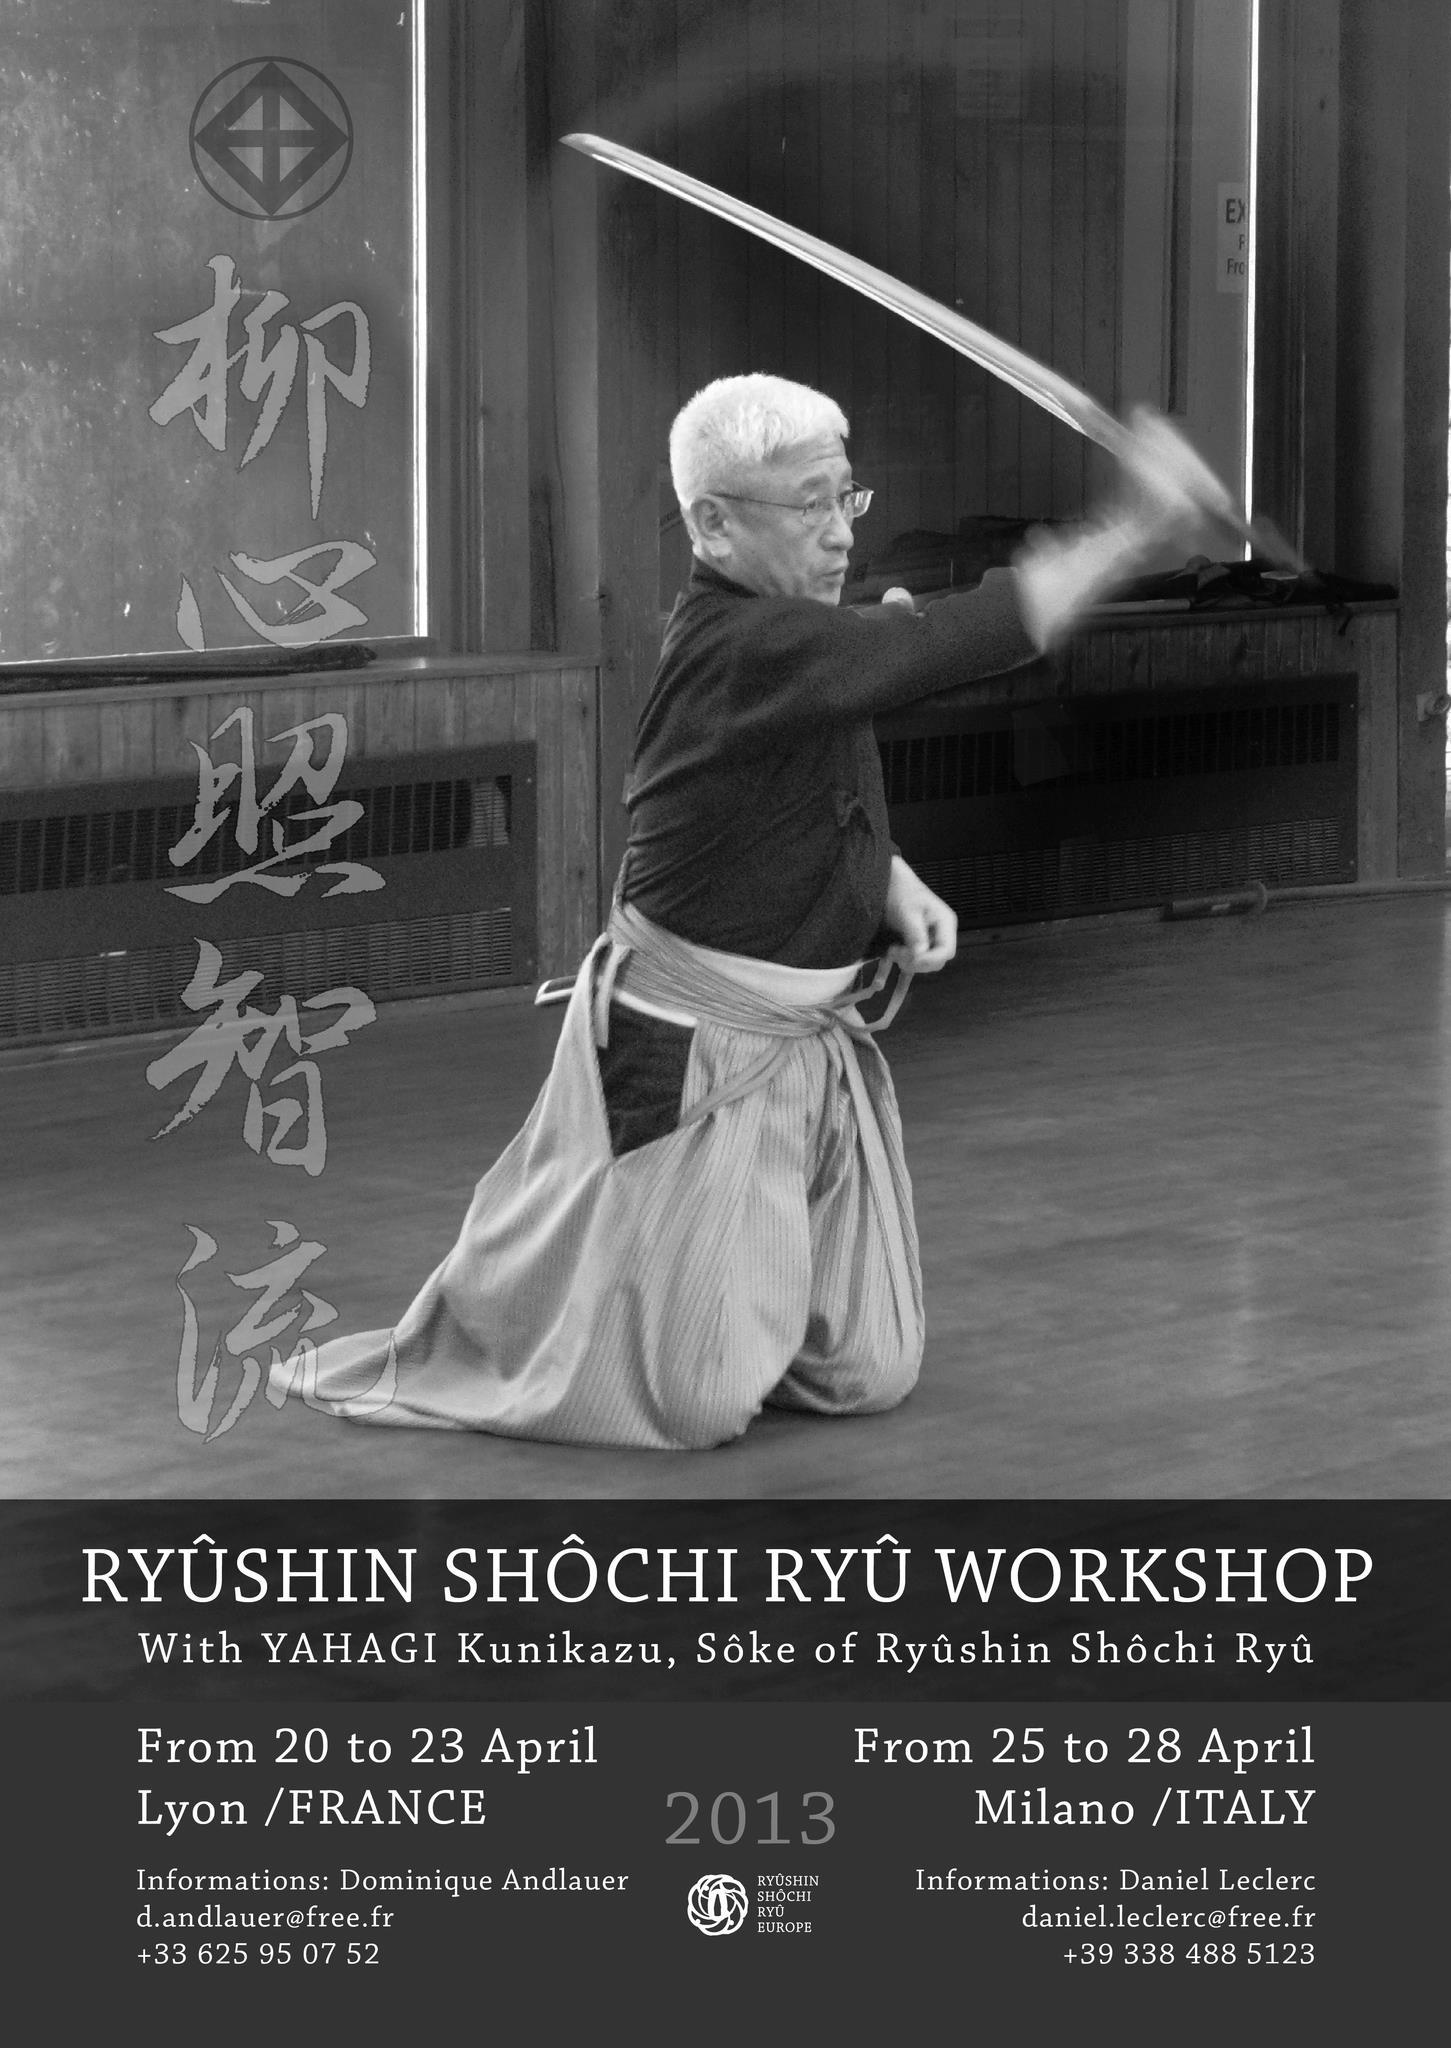 Ryushin Shochi Ryu